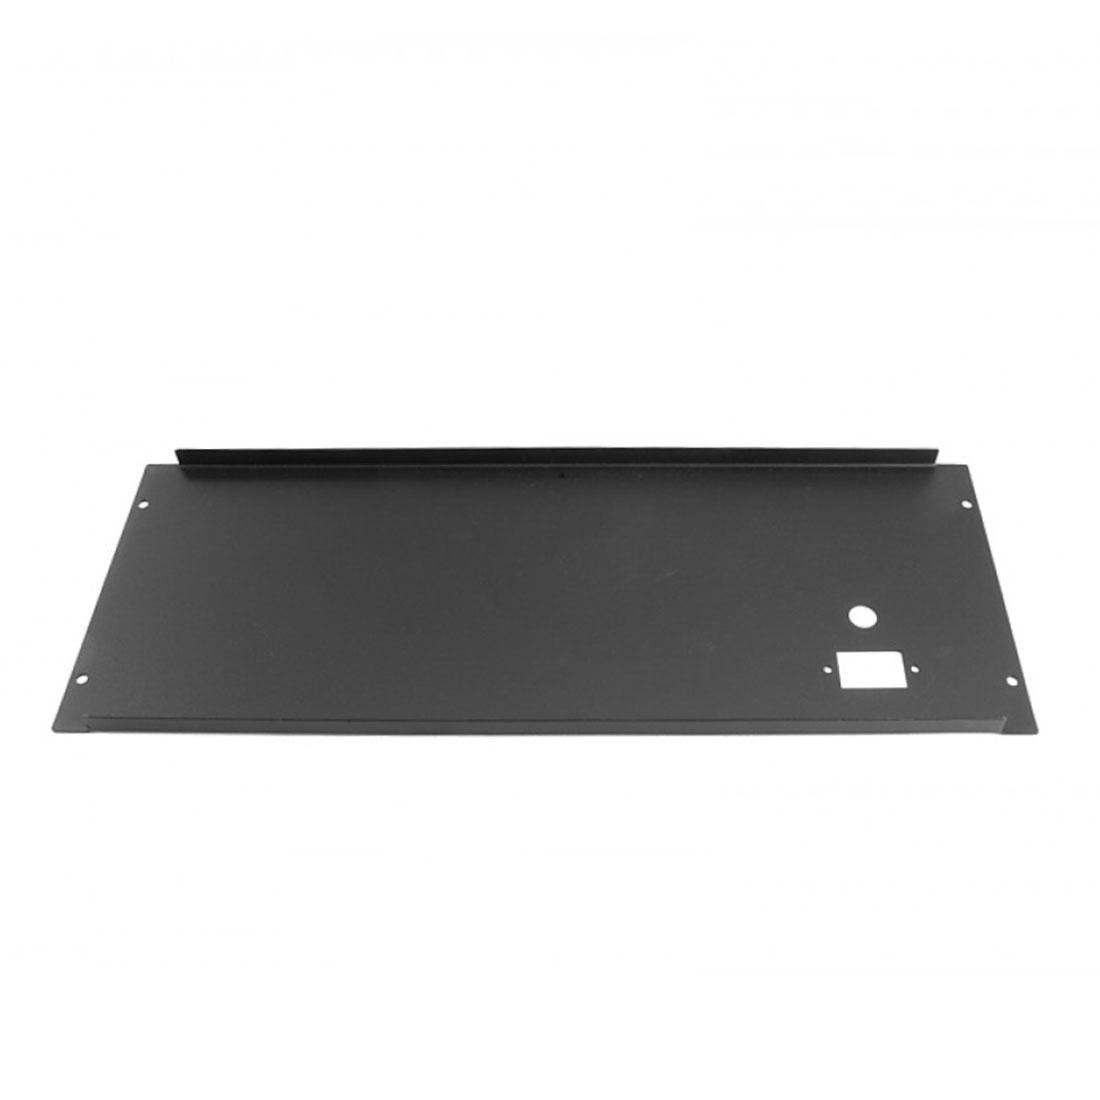 1PS04PN - 4U rack krabice plechová, 300mm, 4mm - rack panel černý